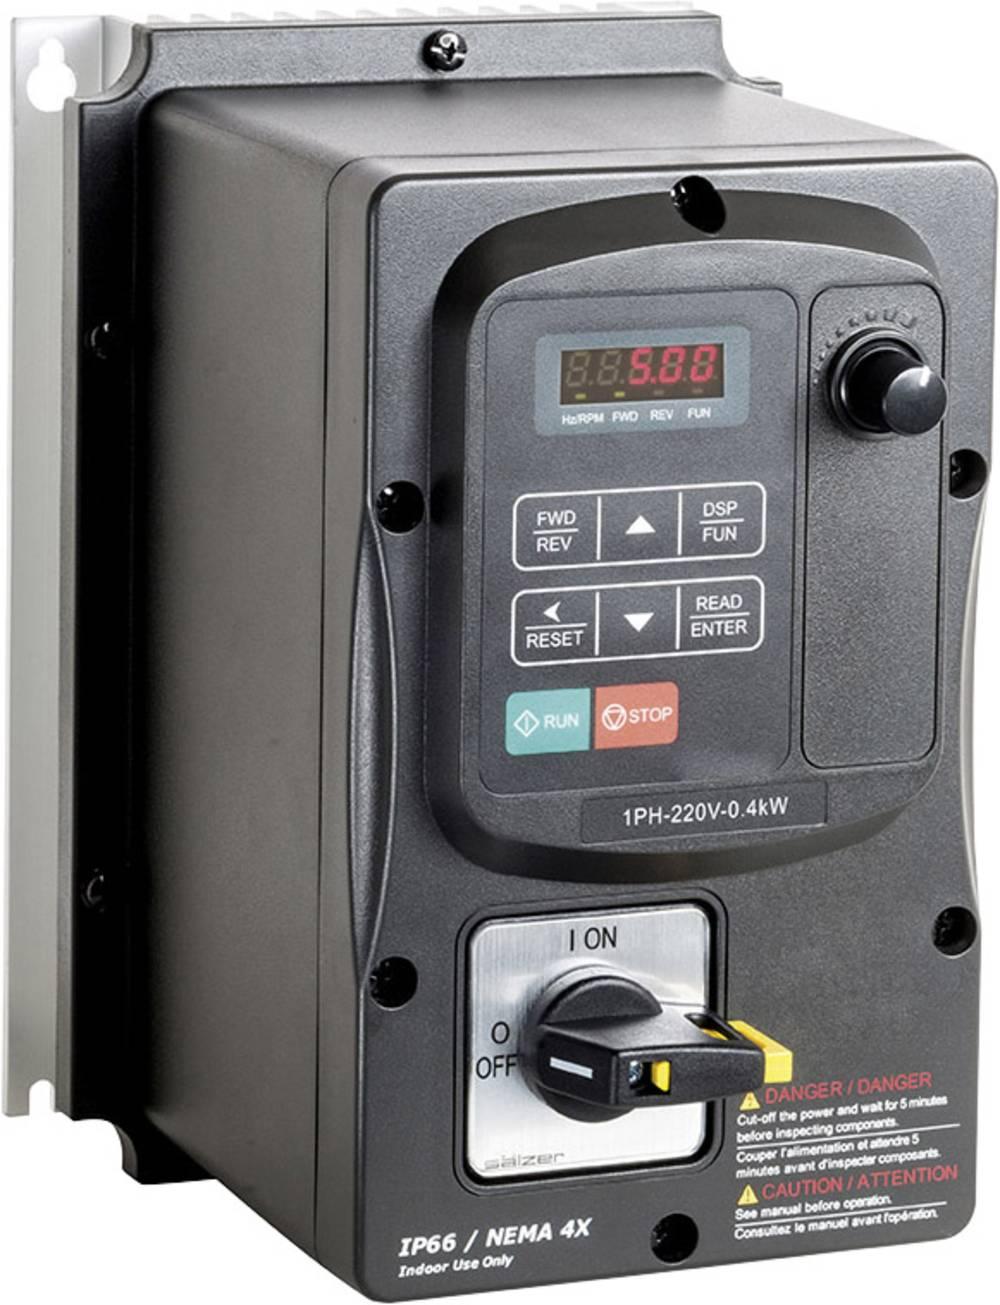 Ispravljač frekvencije FUS 150 E5 IP66 2T101.23150 Peter Electronic 1-fazni 200 - 240 V 1.5 kW